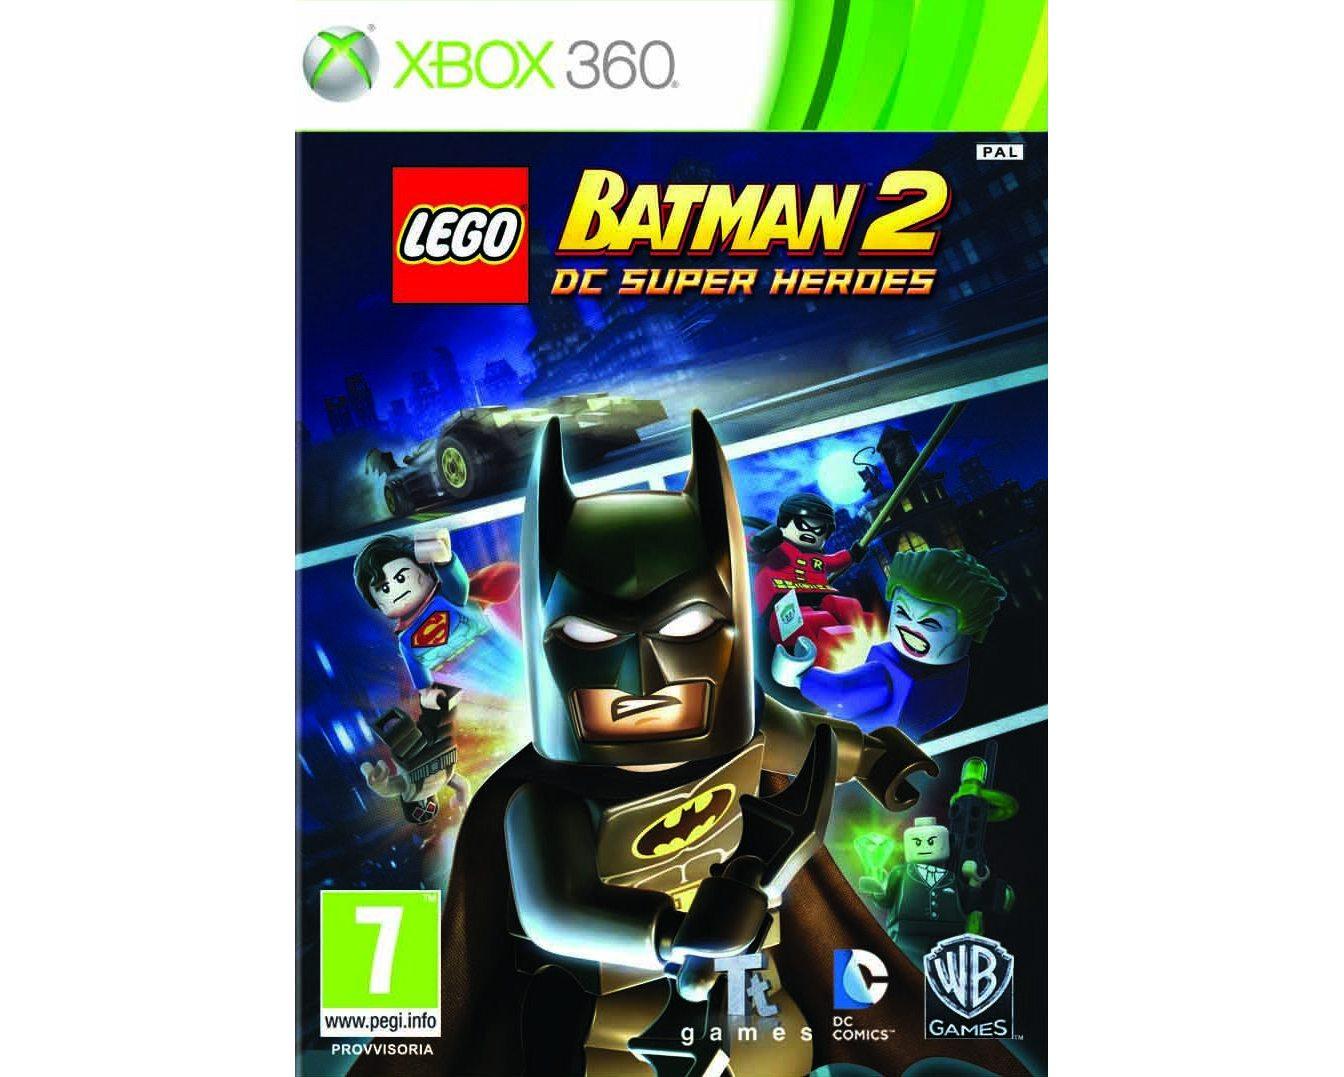 Xbox 360 LEGO Batman 2: DC Super Heroes Xbox 360